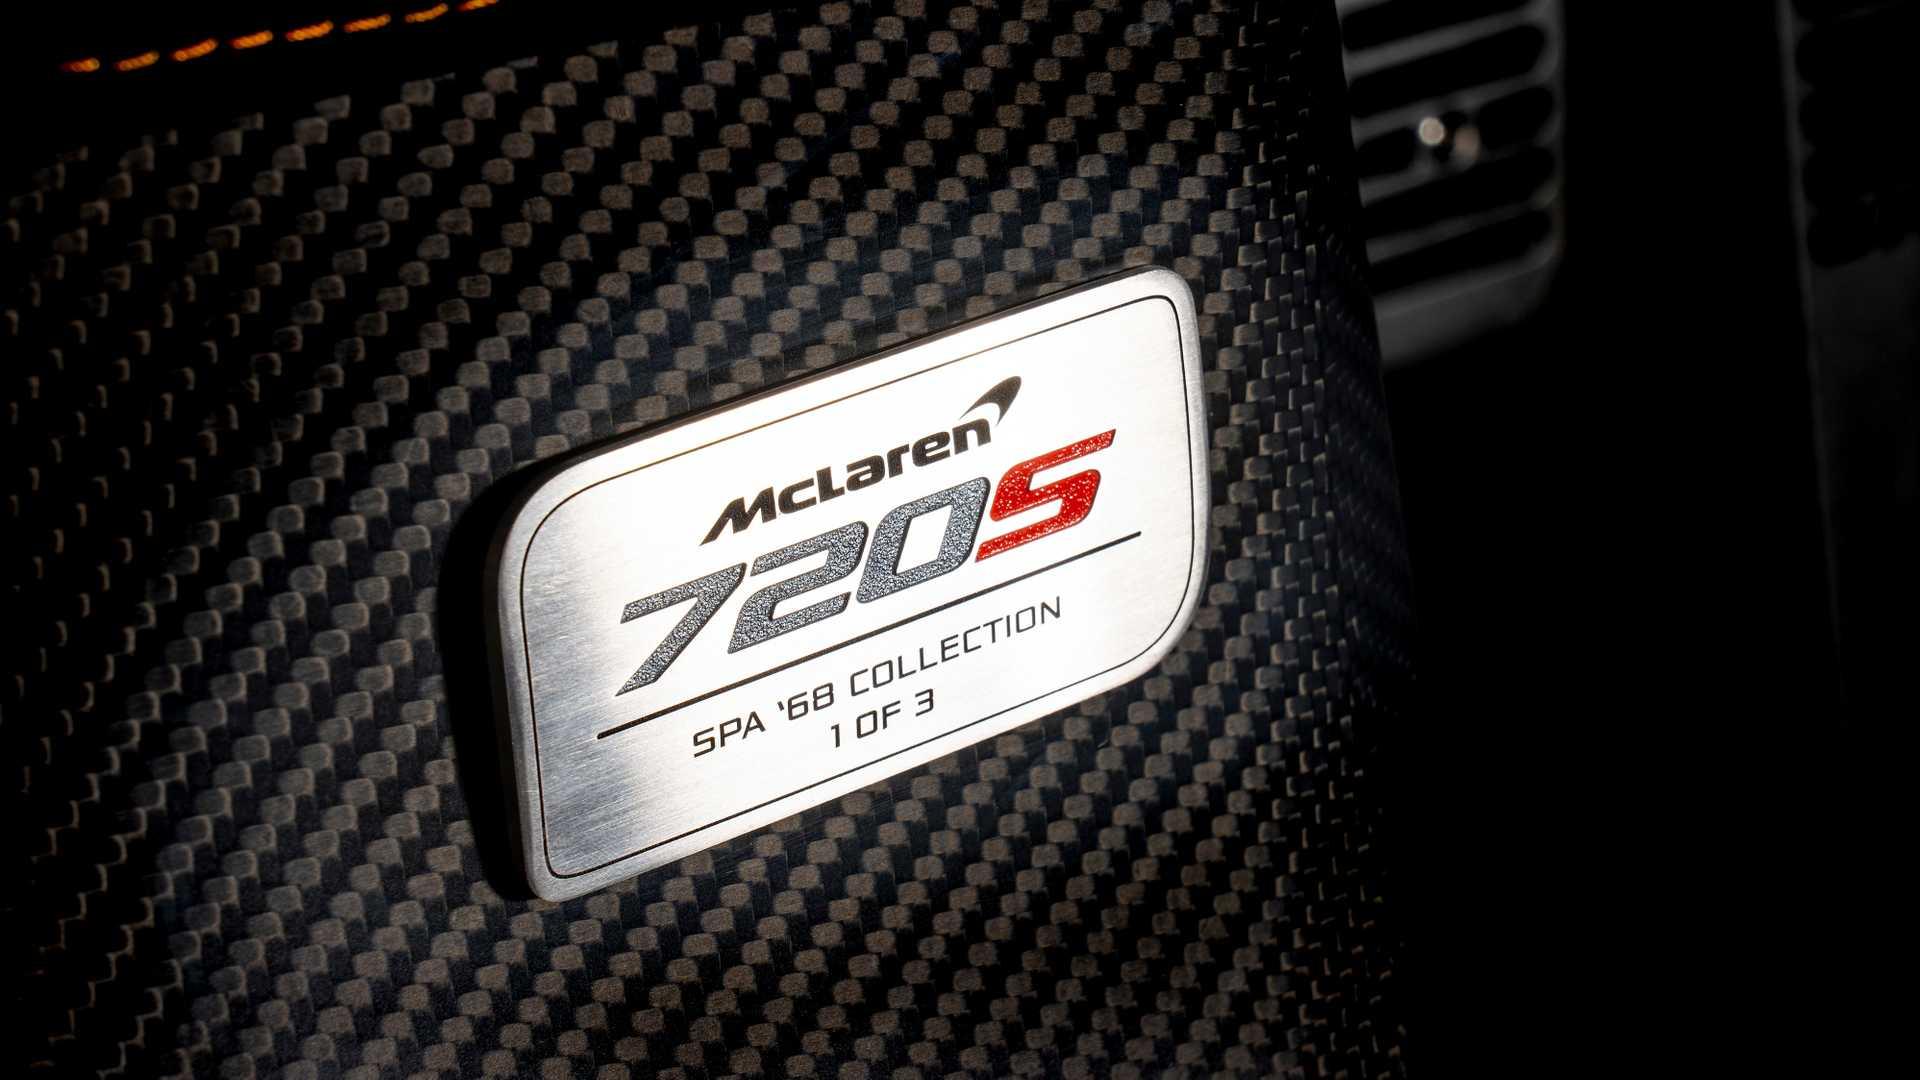 mclaren-720s-spa-68-nameplate